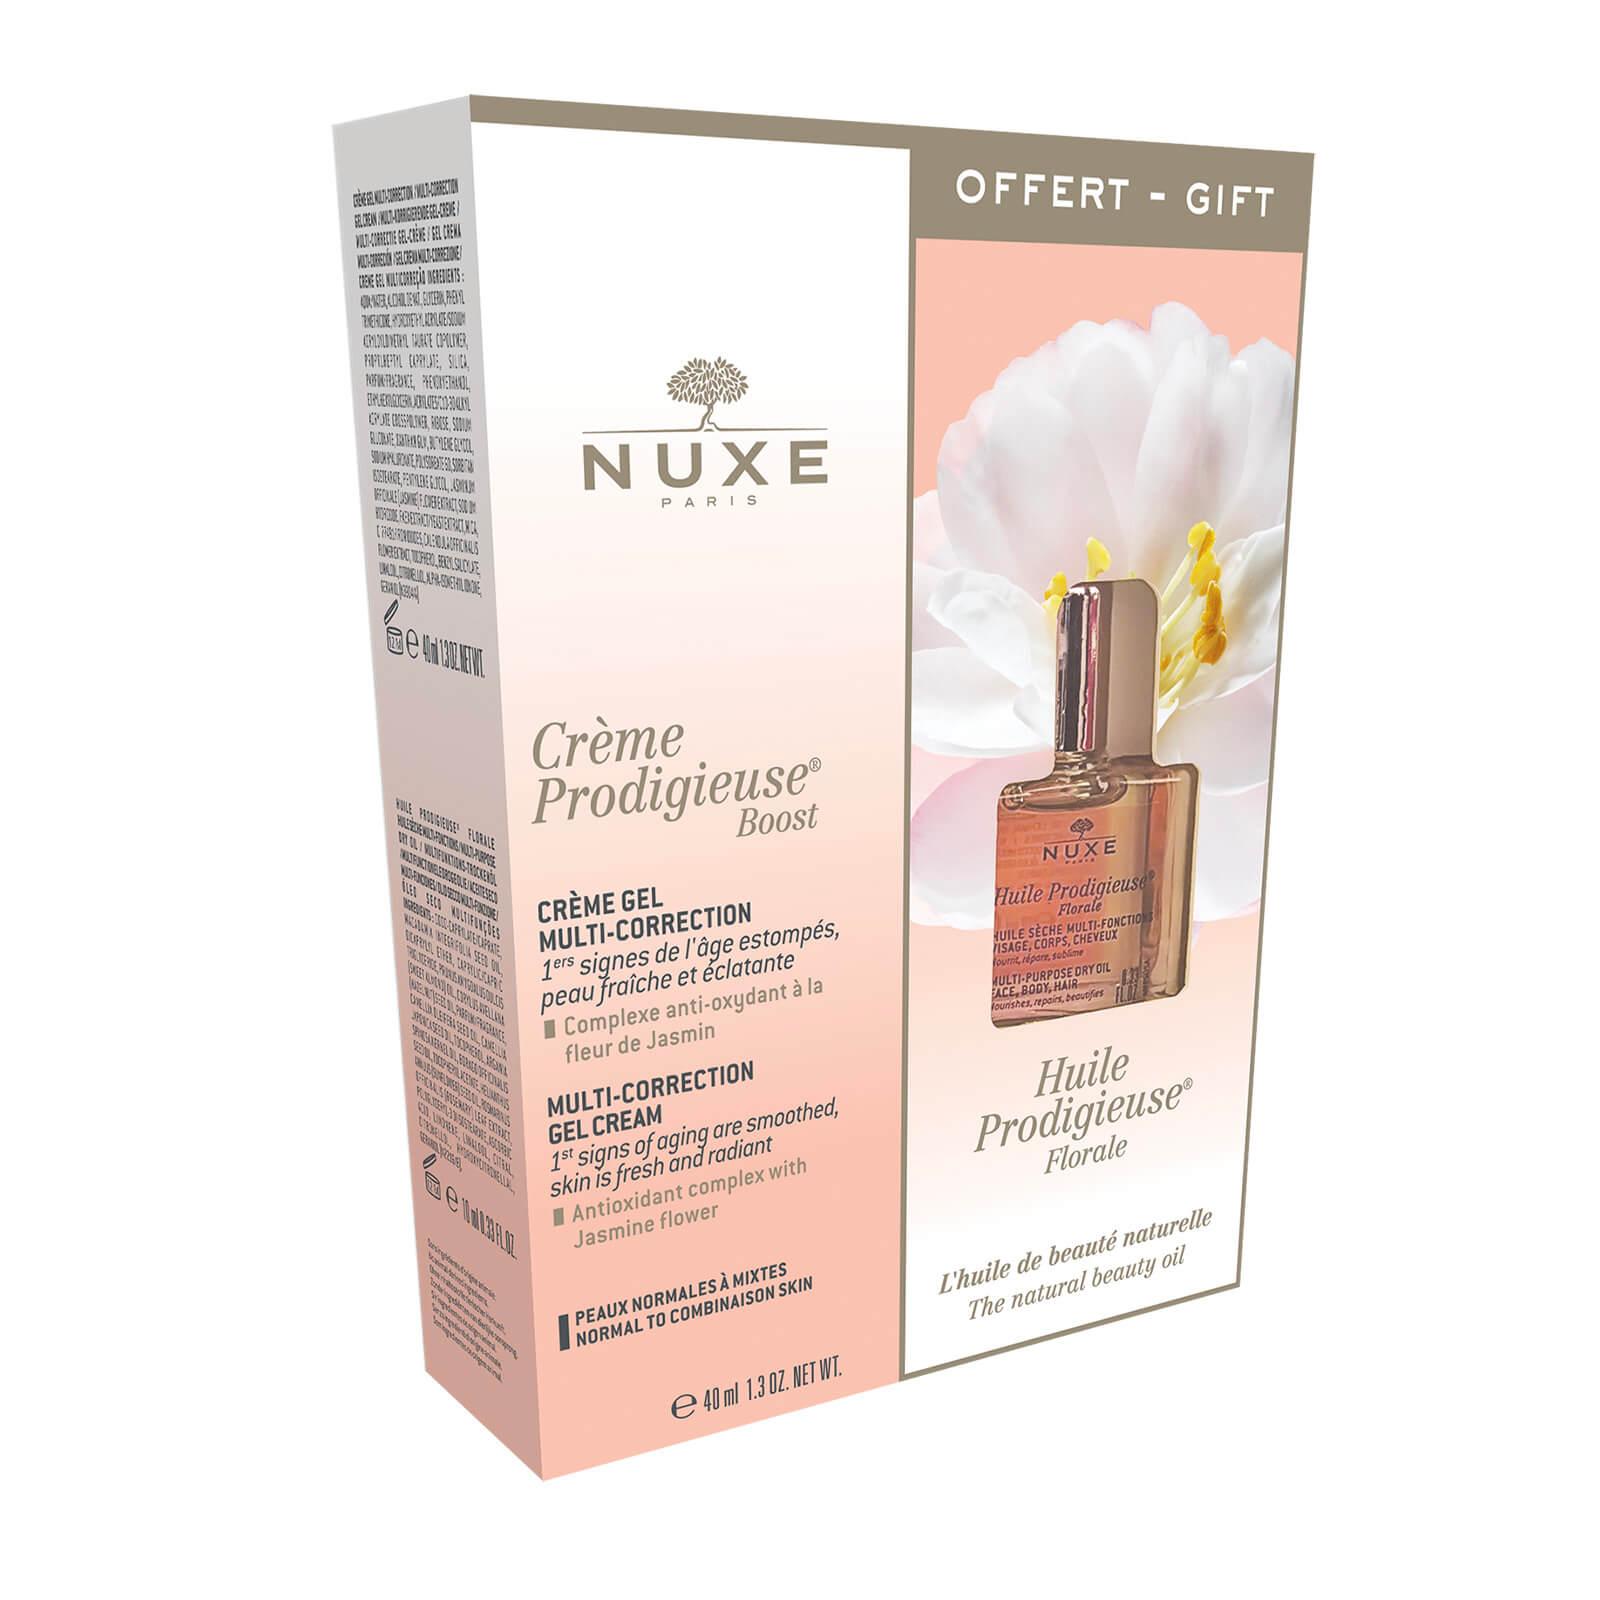 NUXE Crème Prodigieuse Boost Gel Cream Gift Set